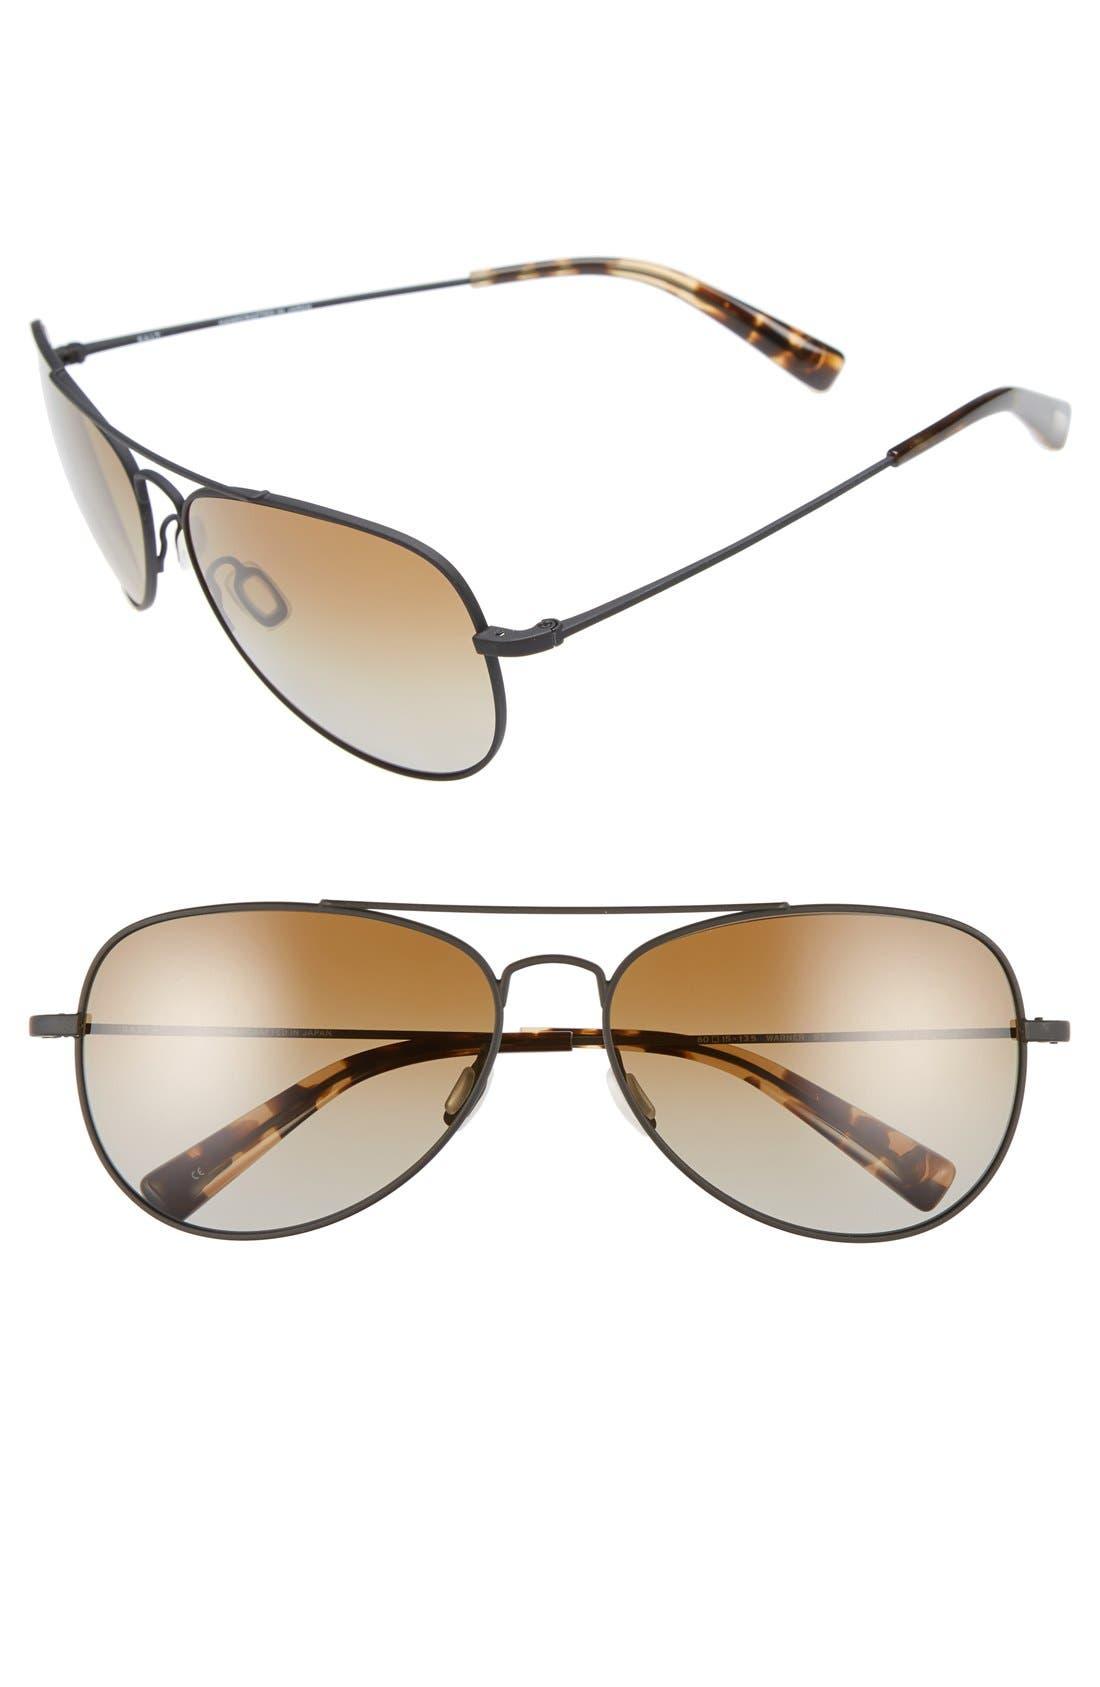 Alternate Image 1 Selected - SALT 'Warner' 60mm Polarized Sunglasses